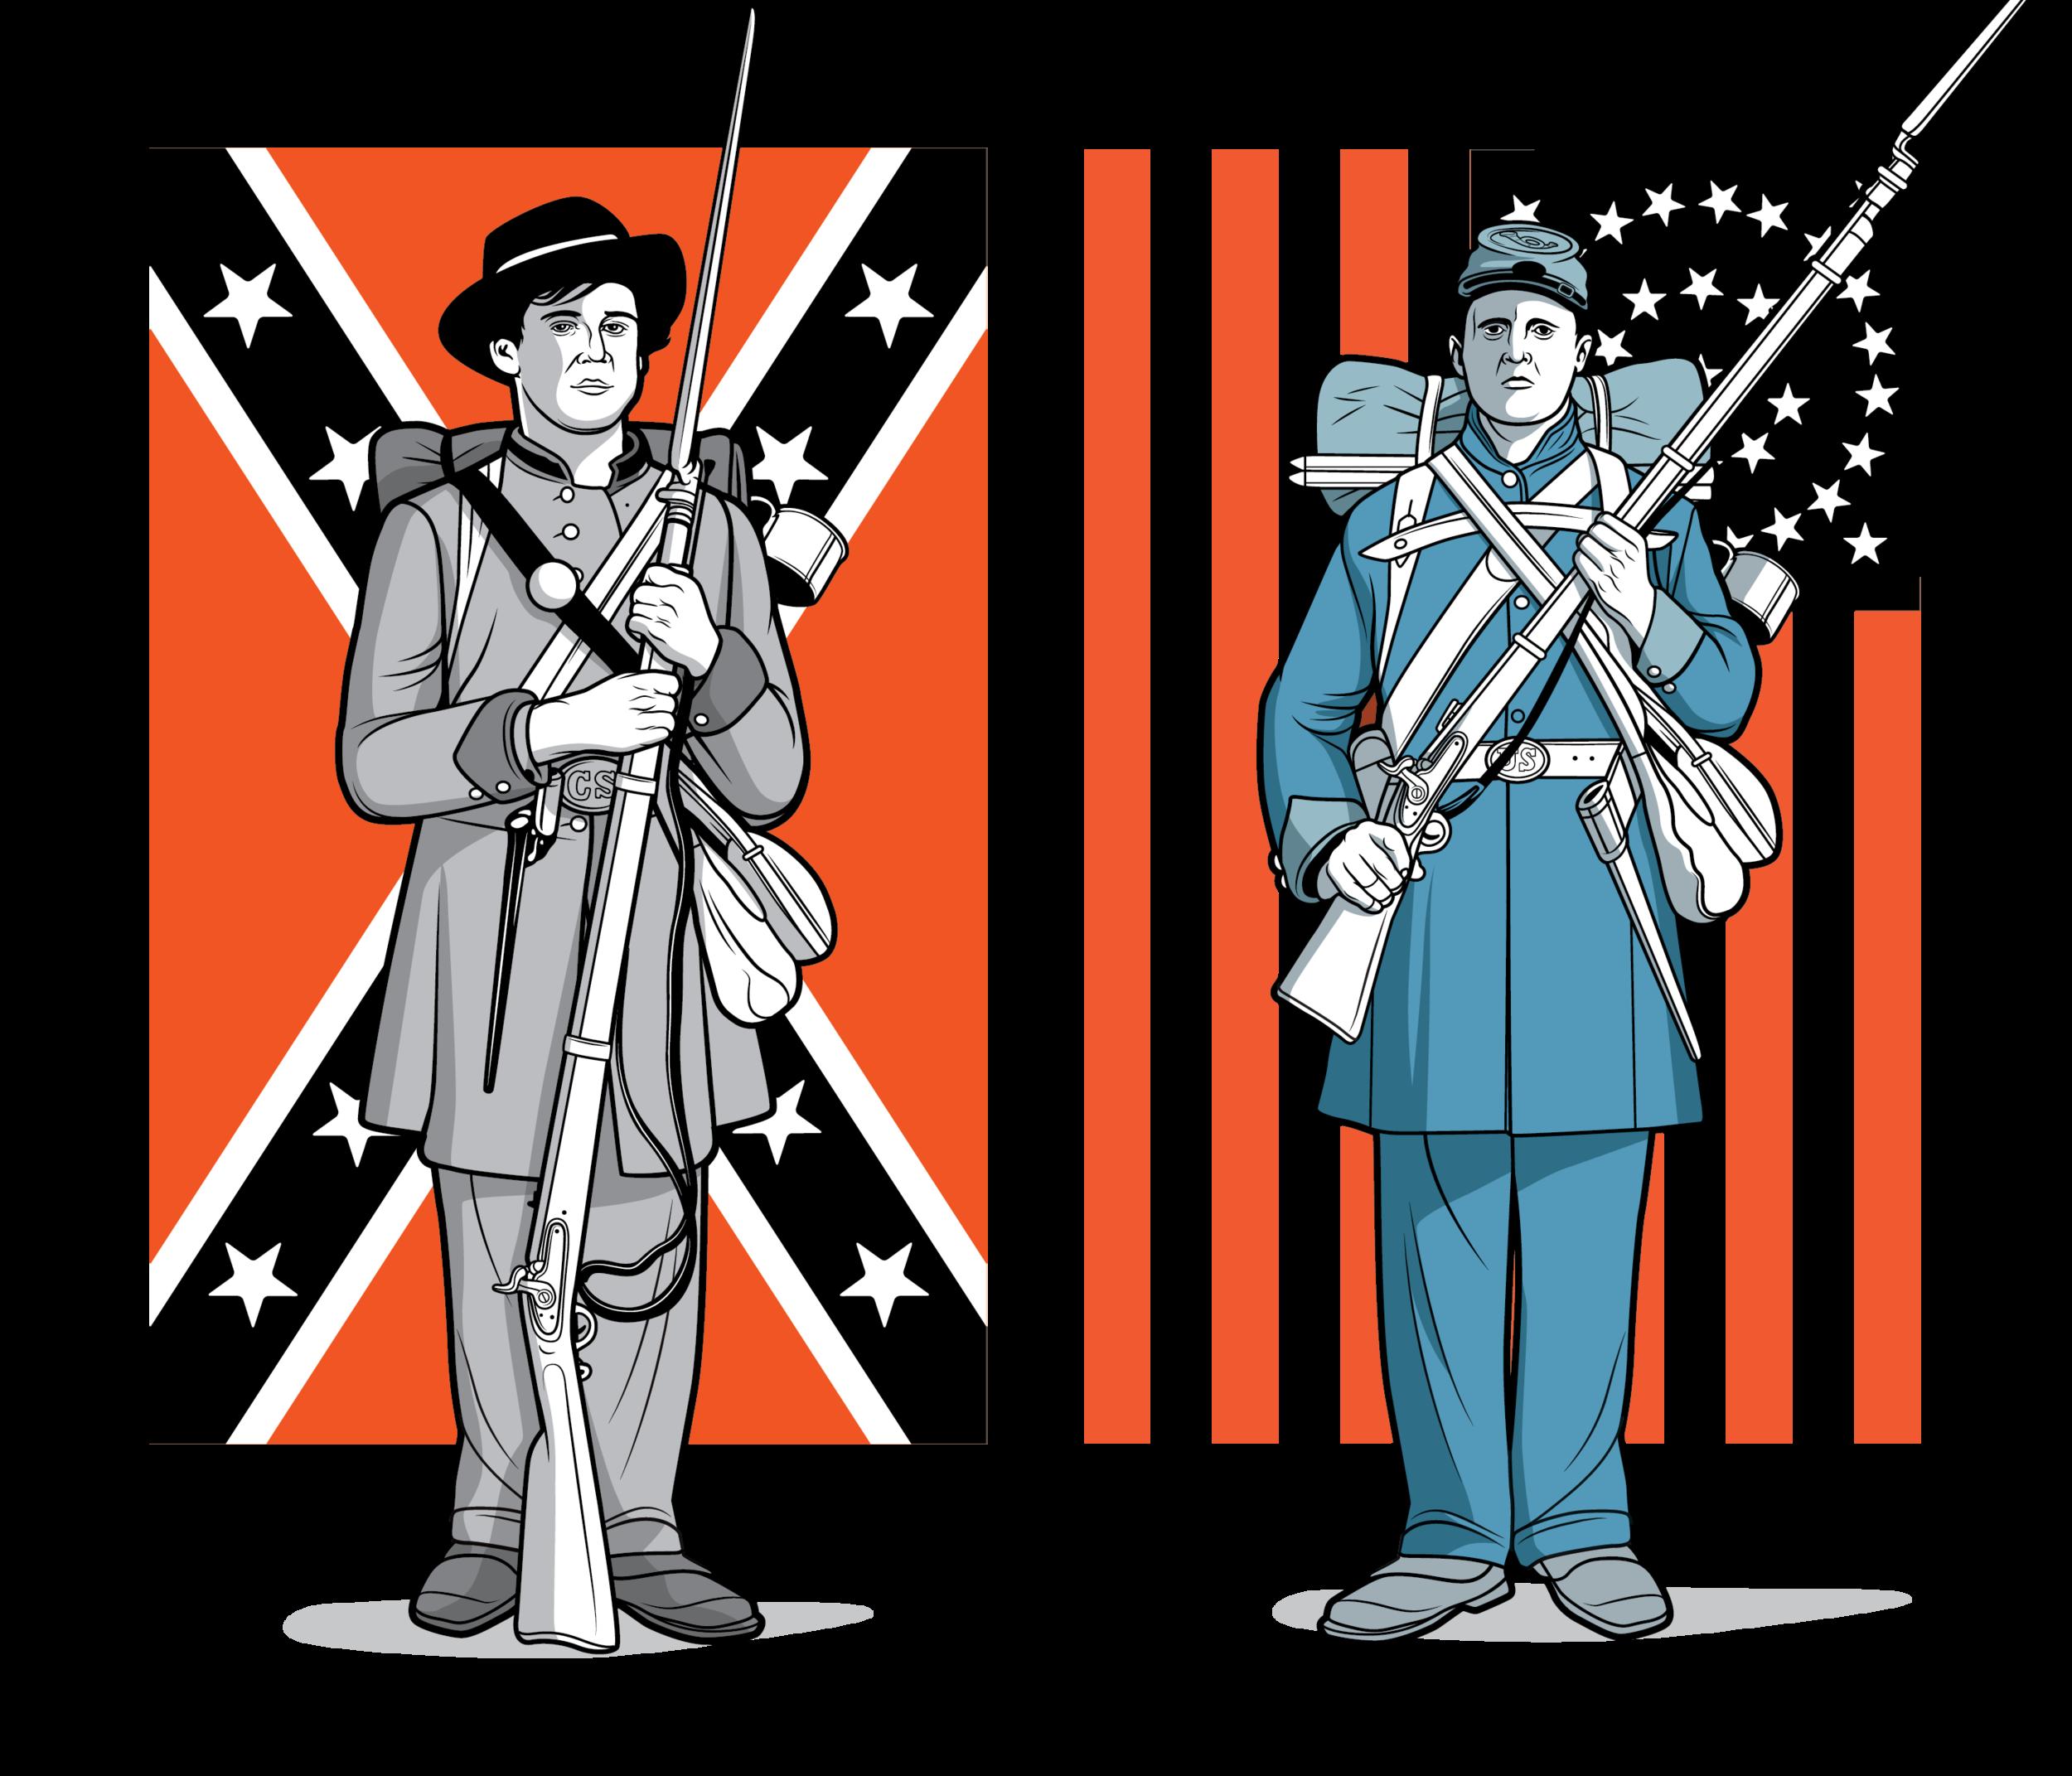 TM_Detwiler_portraits_civilwar_soldiers-01.png